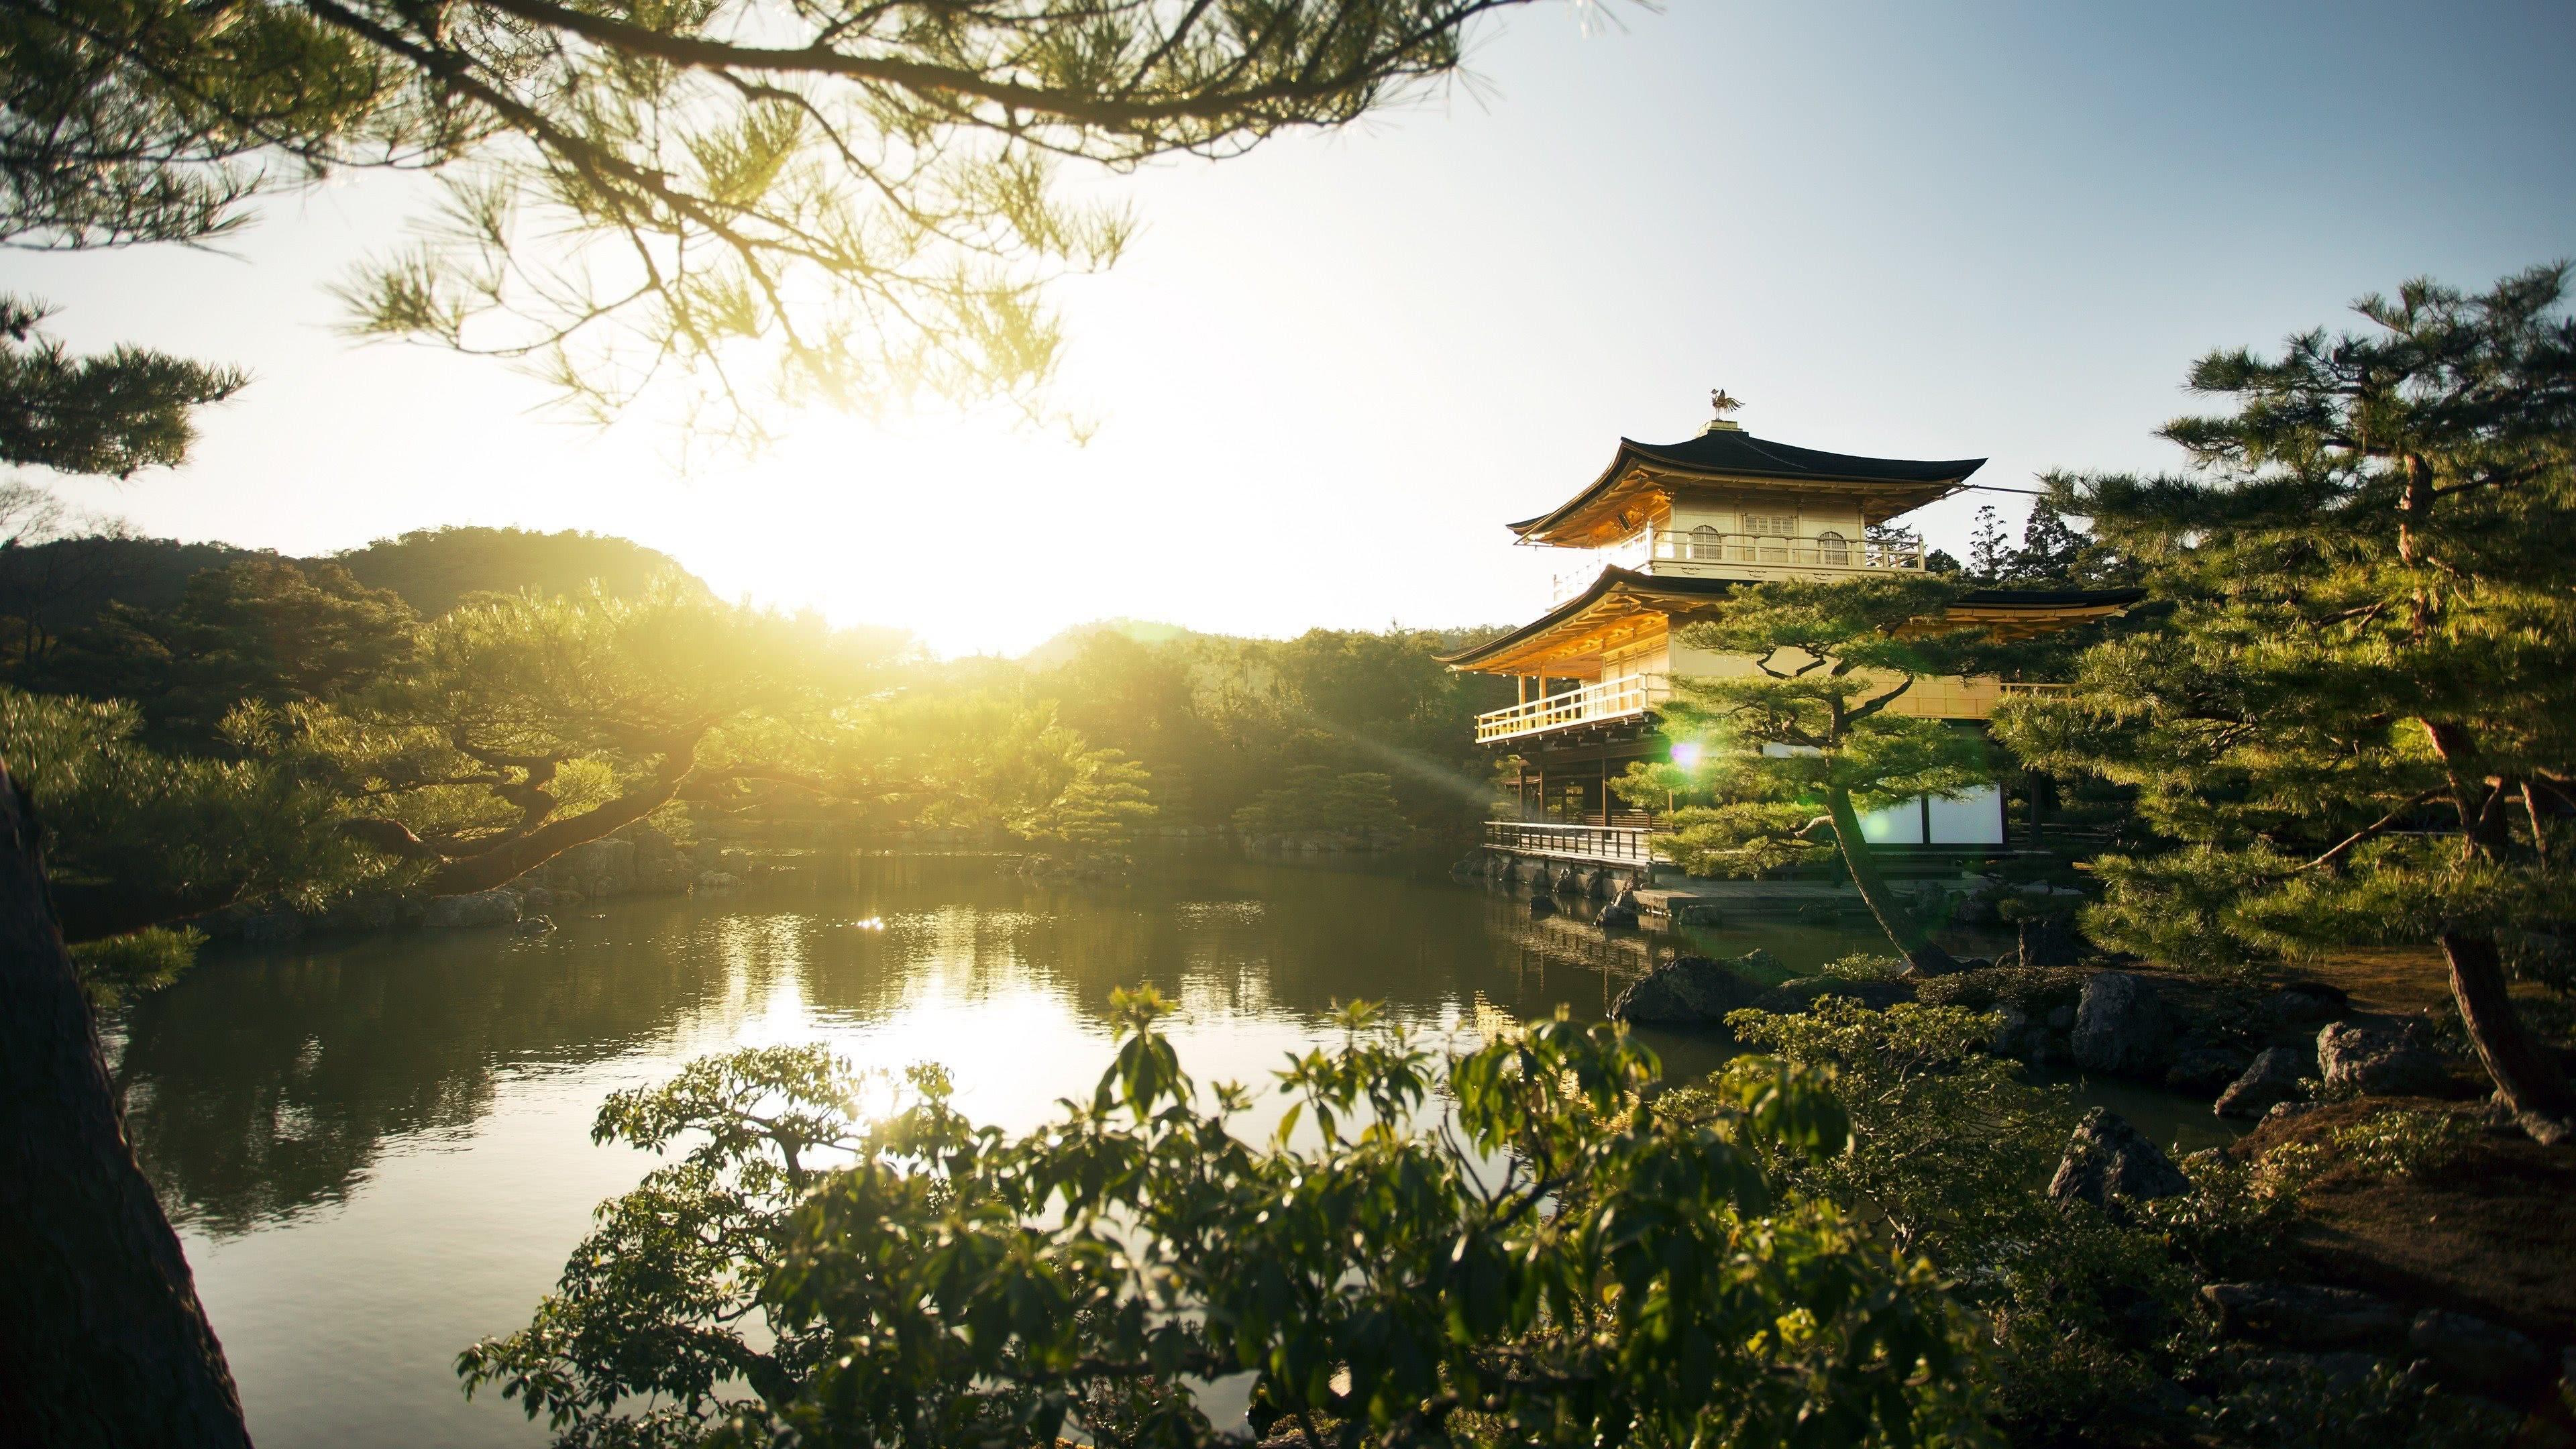 Cars Wallpaper Hd Wallpaper Temple Of The Golden Pavilion Kinkaku Ji Kyoto Uhd 4k